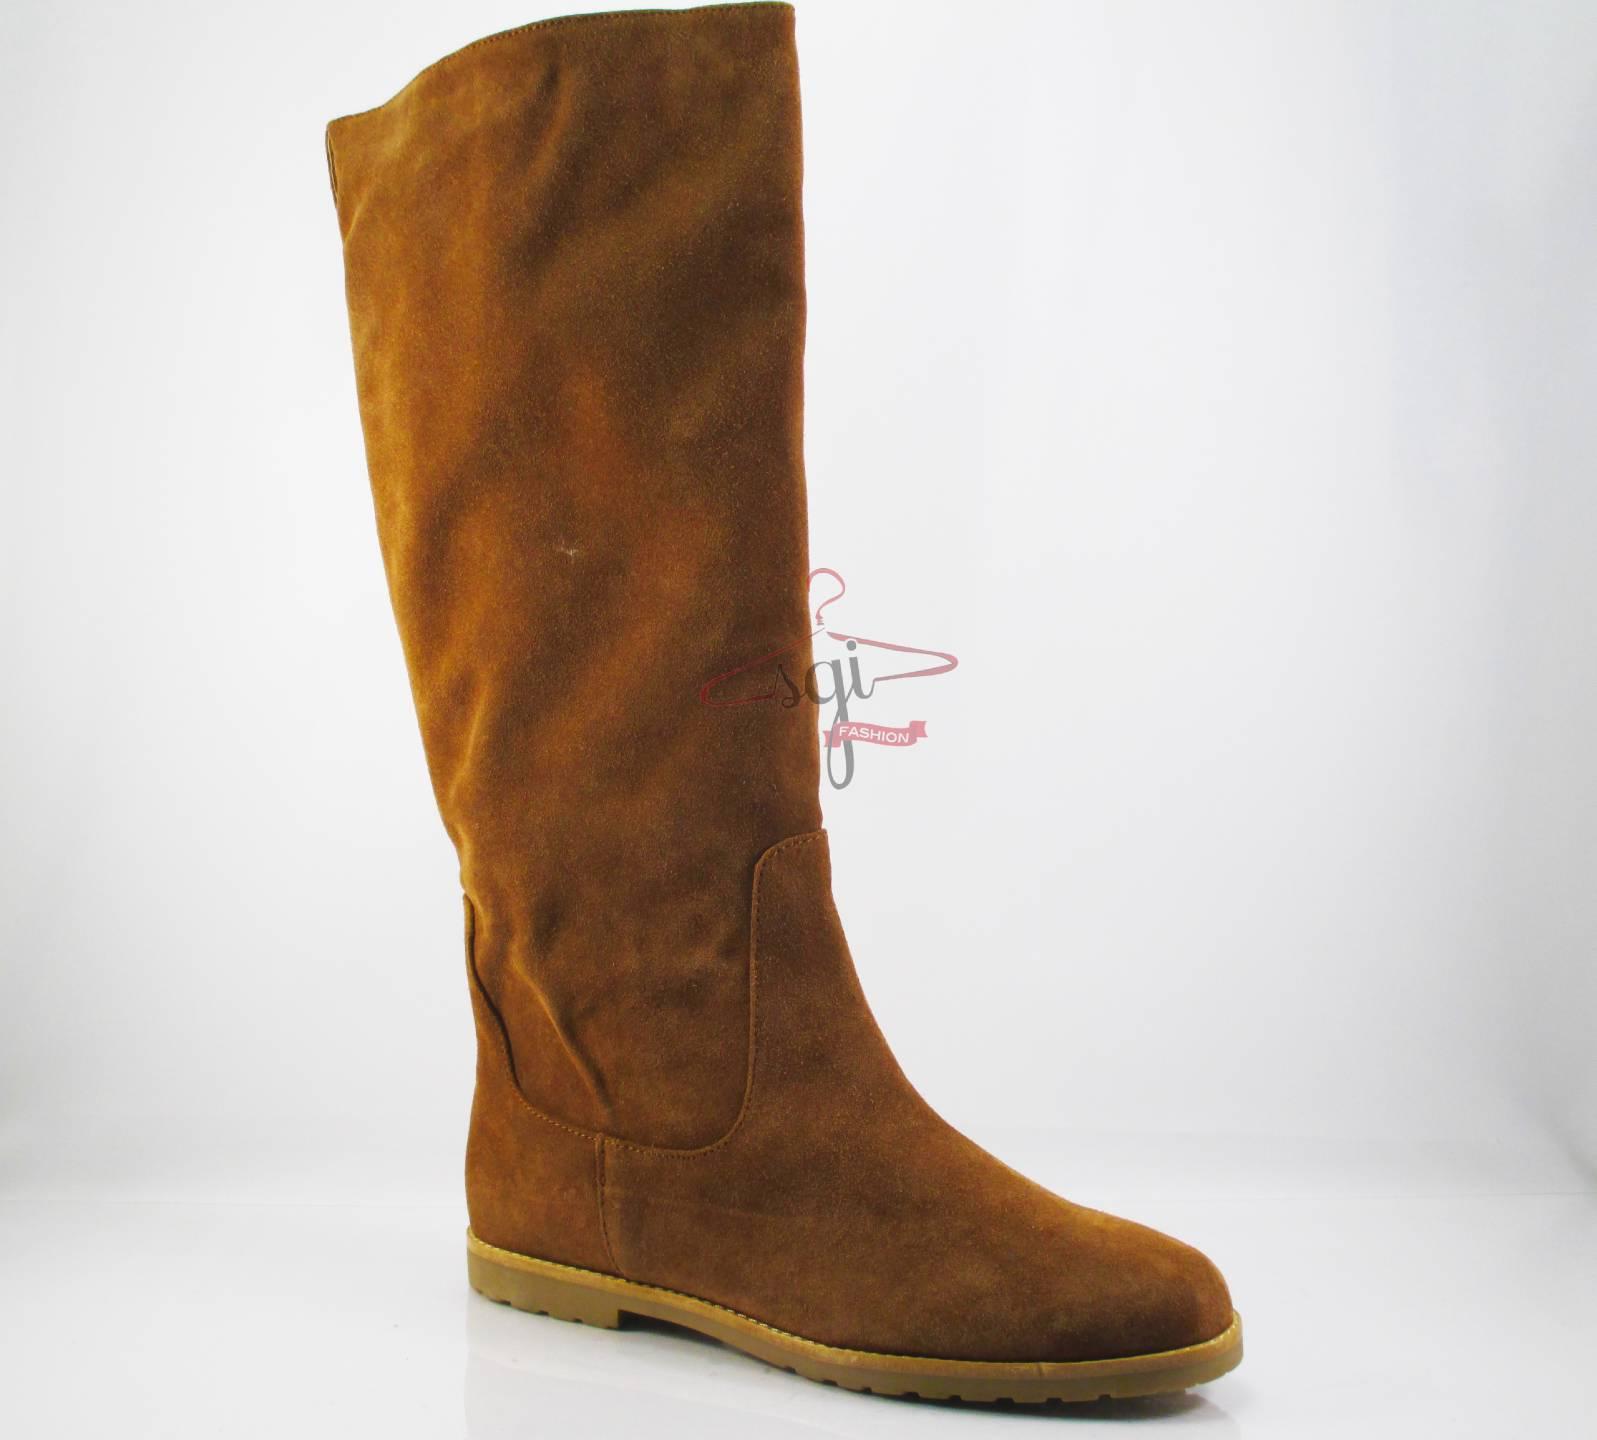 michael kors kenton vicuna suede flat knee high boot